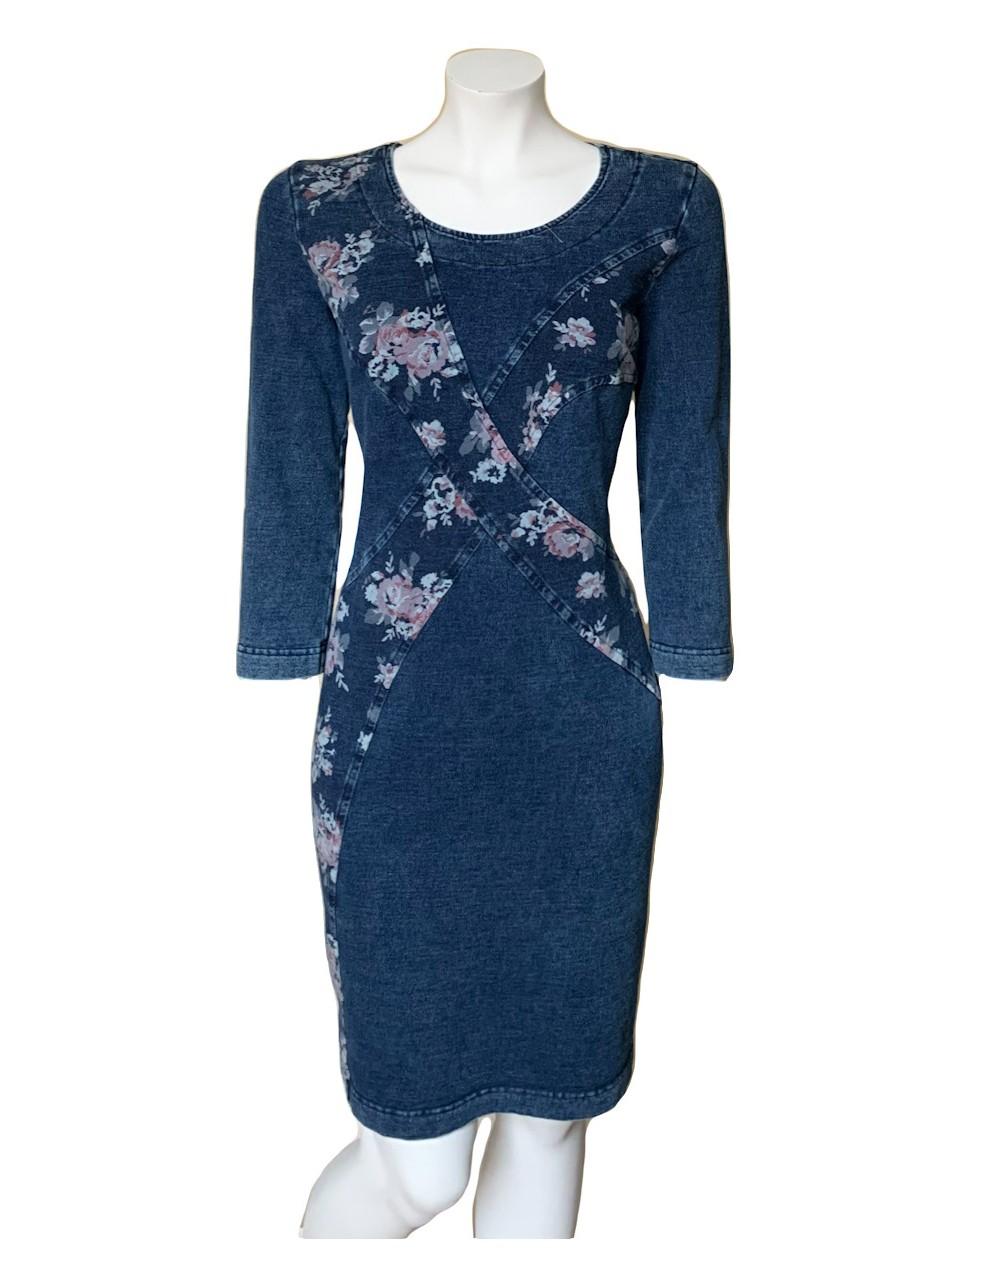 Flora Print Denim Dress|Dresses|Irish Handcrafts 1